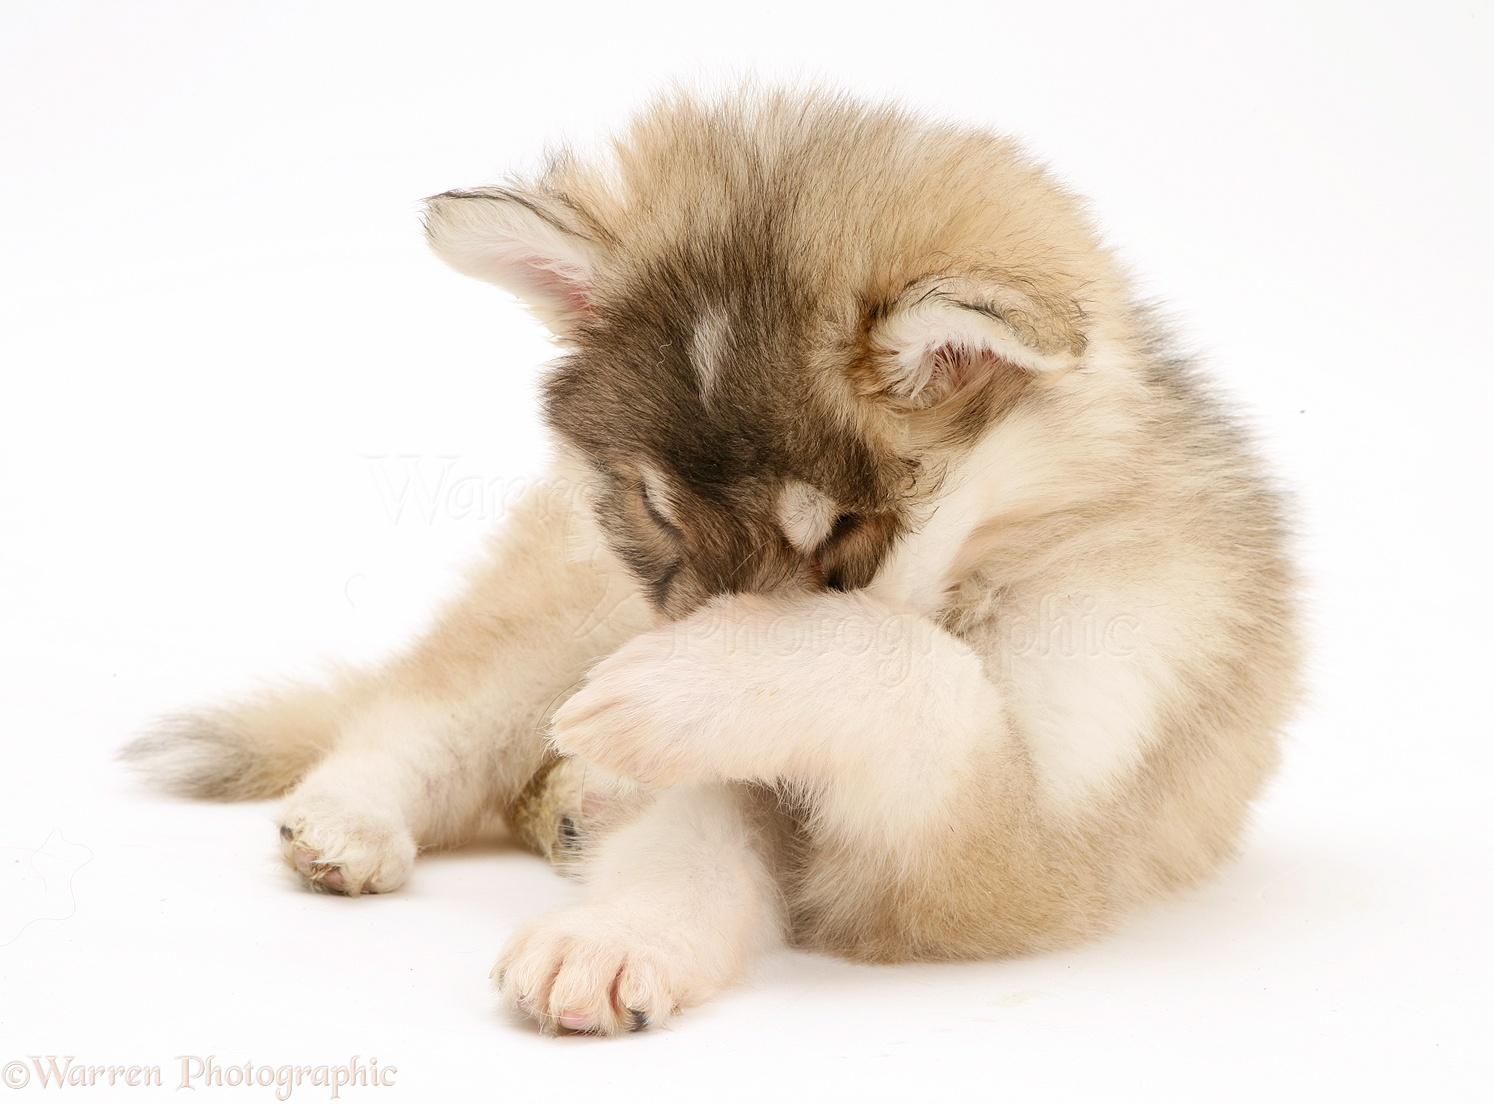 Dog: Utonagan puppy hiding its face in shame photo - WP42440: www.warrenphotographic.co.uk/42440-utonagan-puppy-hiding-its-face...